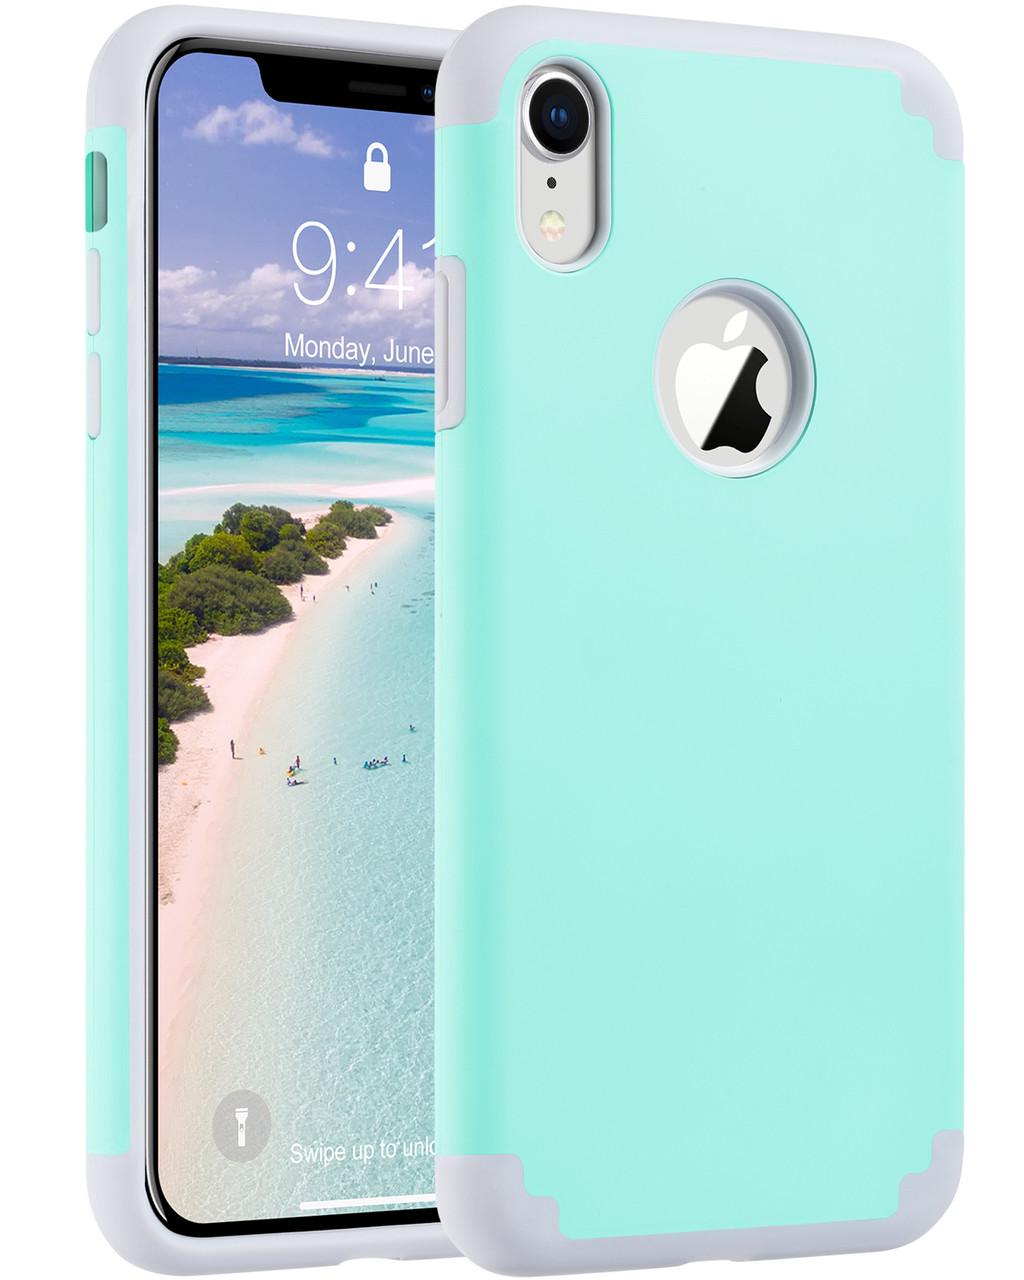 Защитный чехол для Apple iPhone XR 2018 6,1 дюйма ментоловый